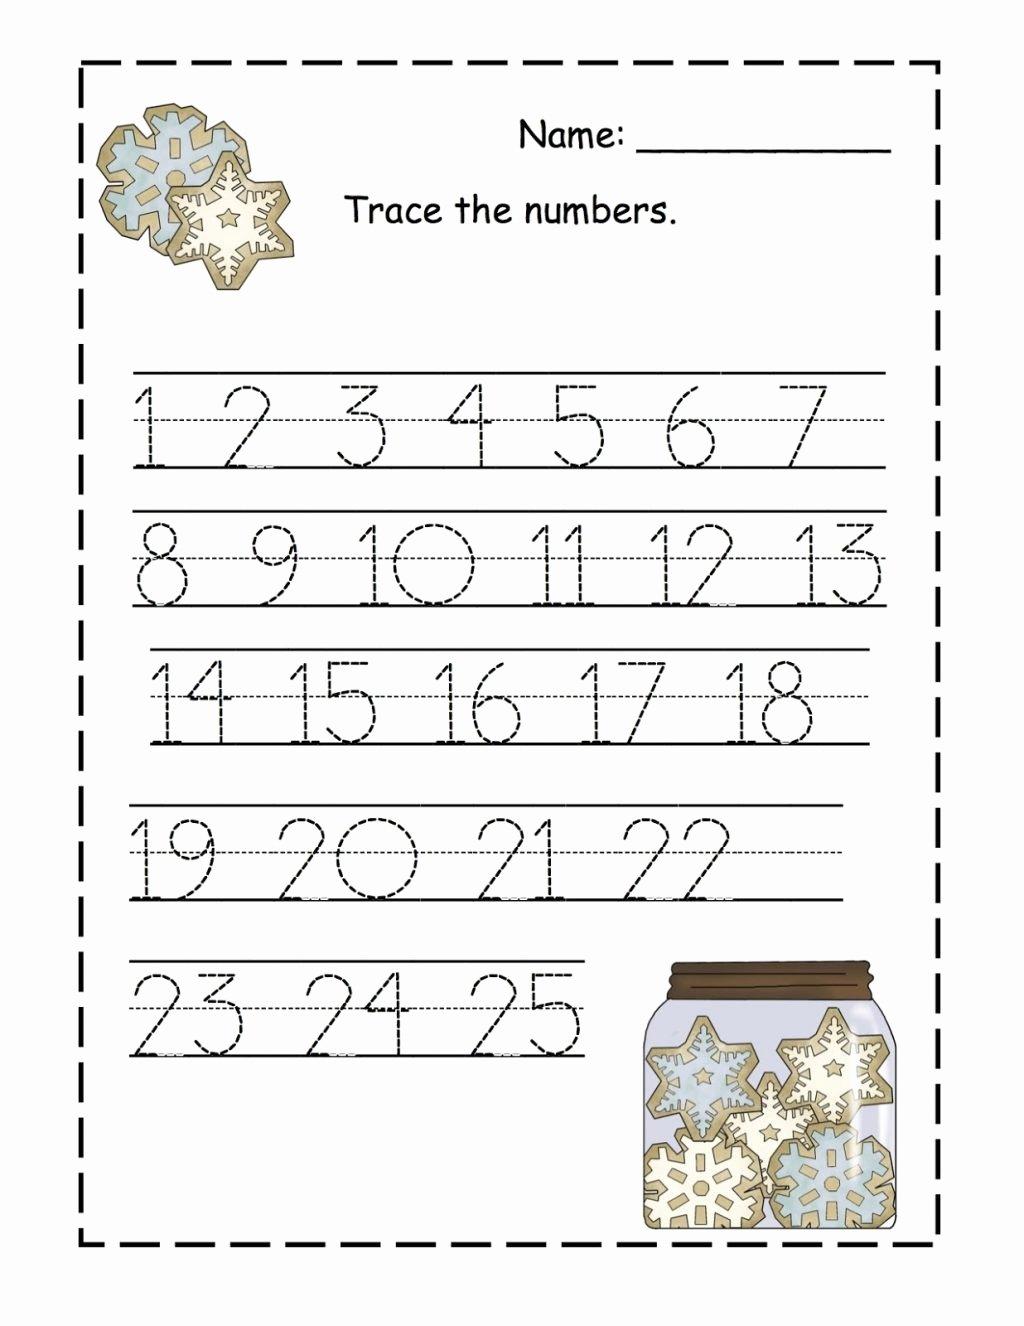 Number Tracing Worksheets for Preschoolers Awesome Worksheet Worksheet Free Tracing Worksheets astonishing